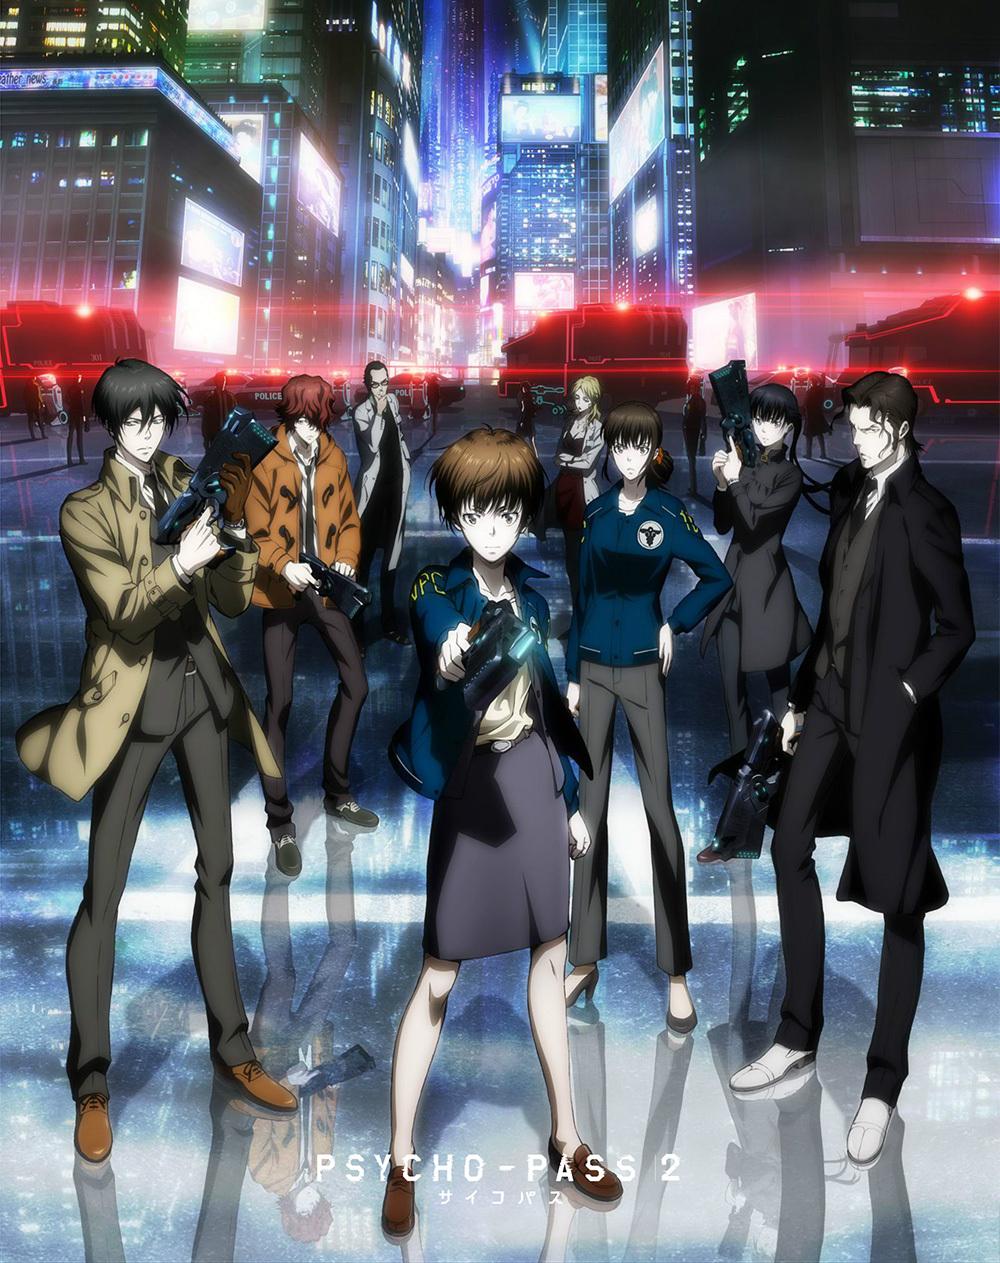 Psycho-Pass-2-anime-visual-haruhichan.com-Gen-Urobuchi-psycho-pass-season-2-anime